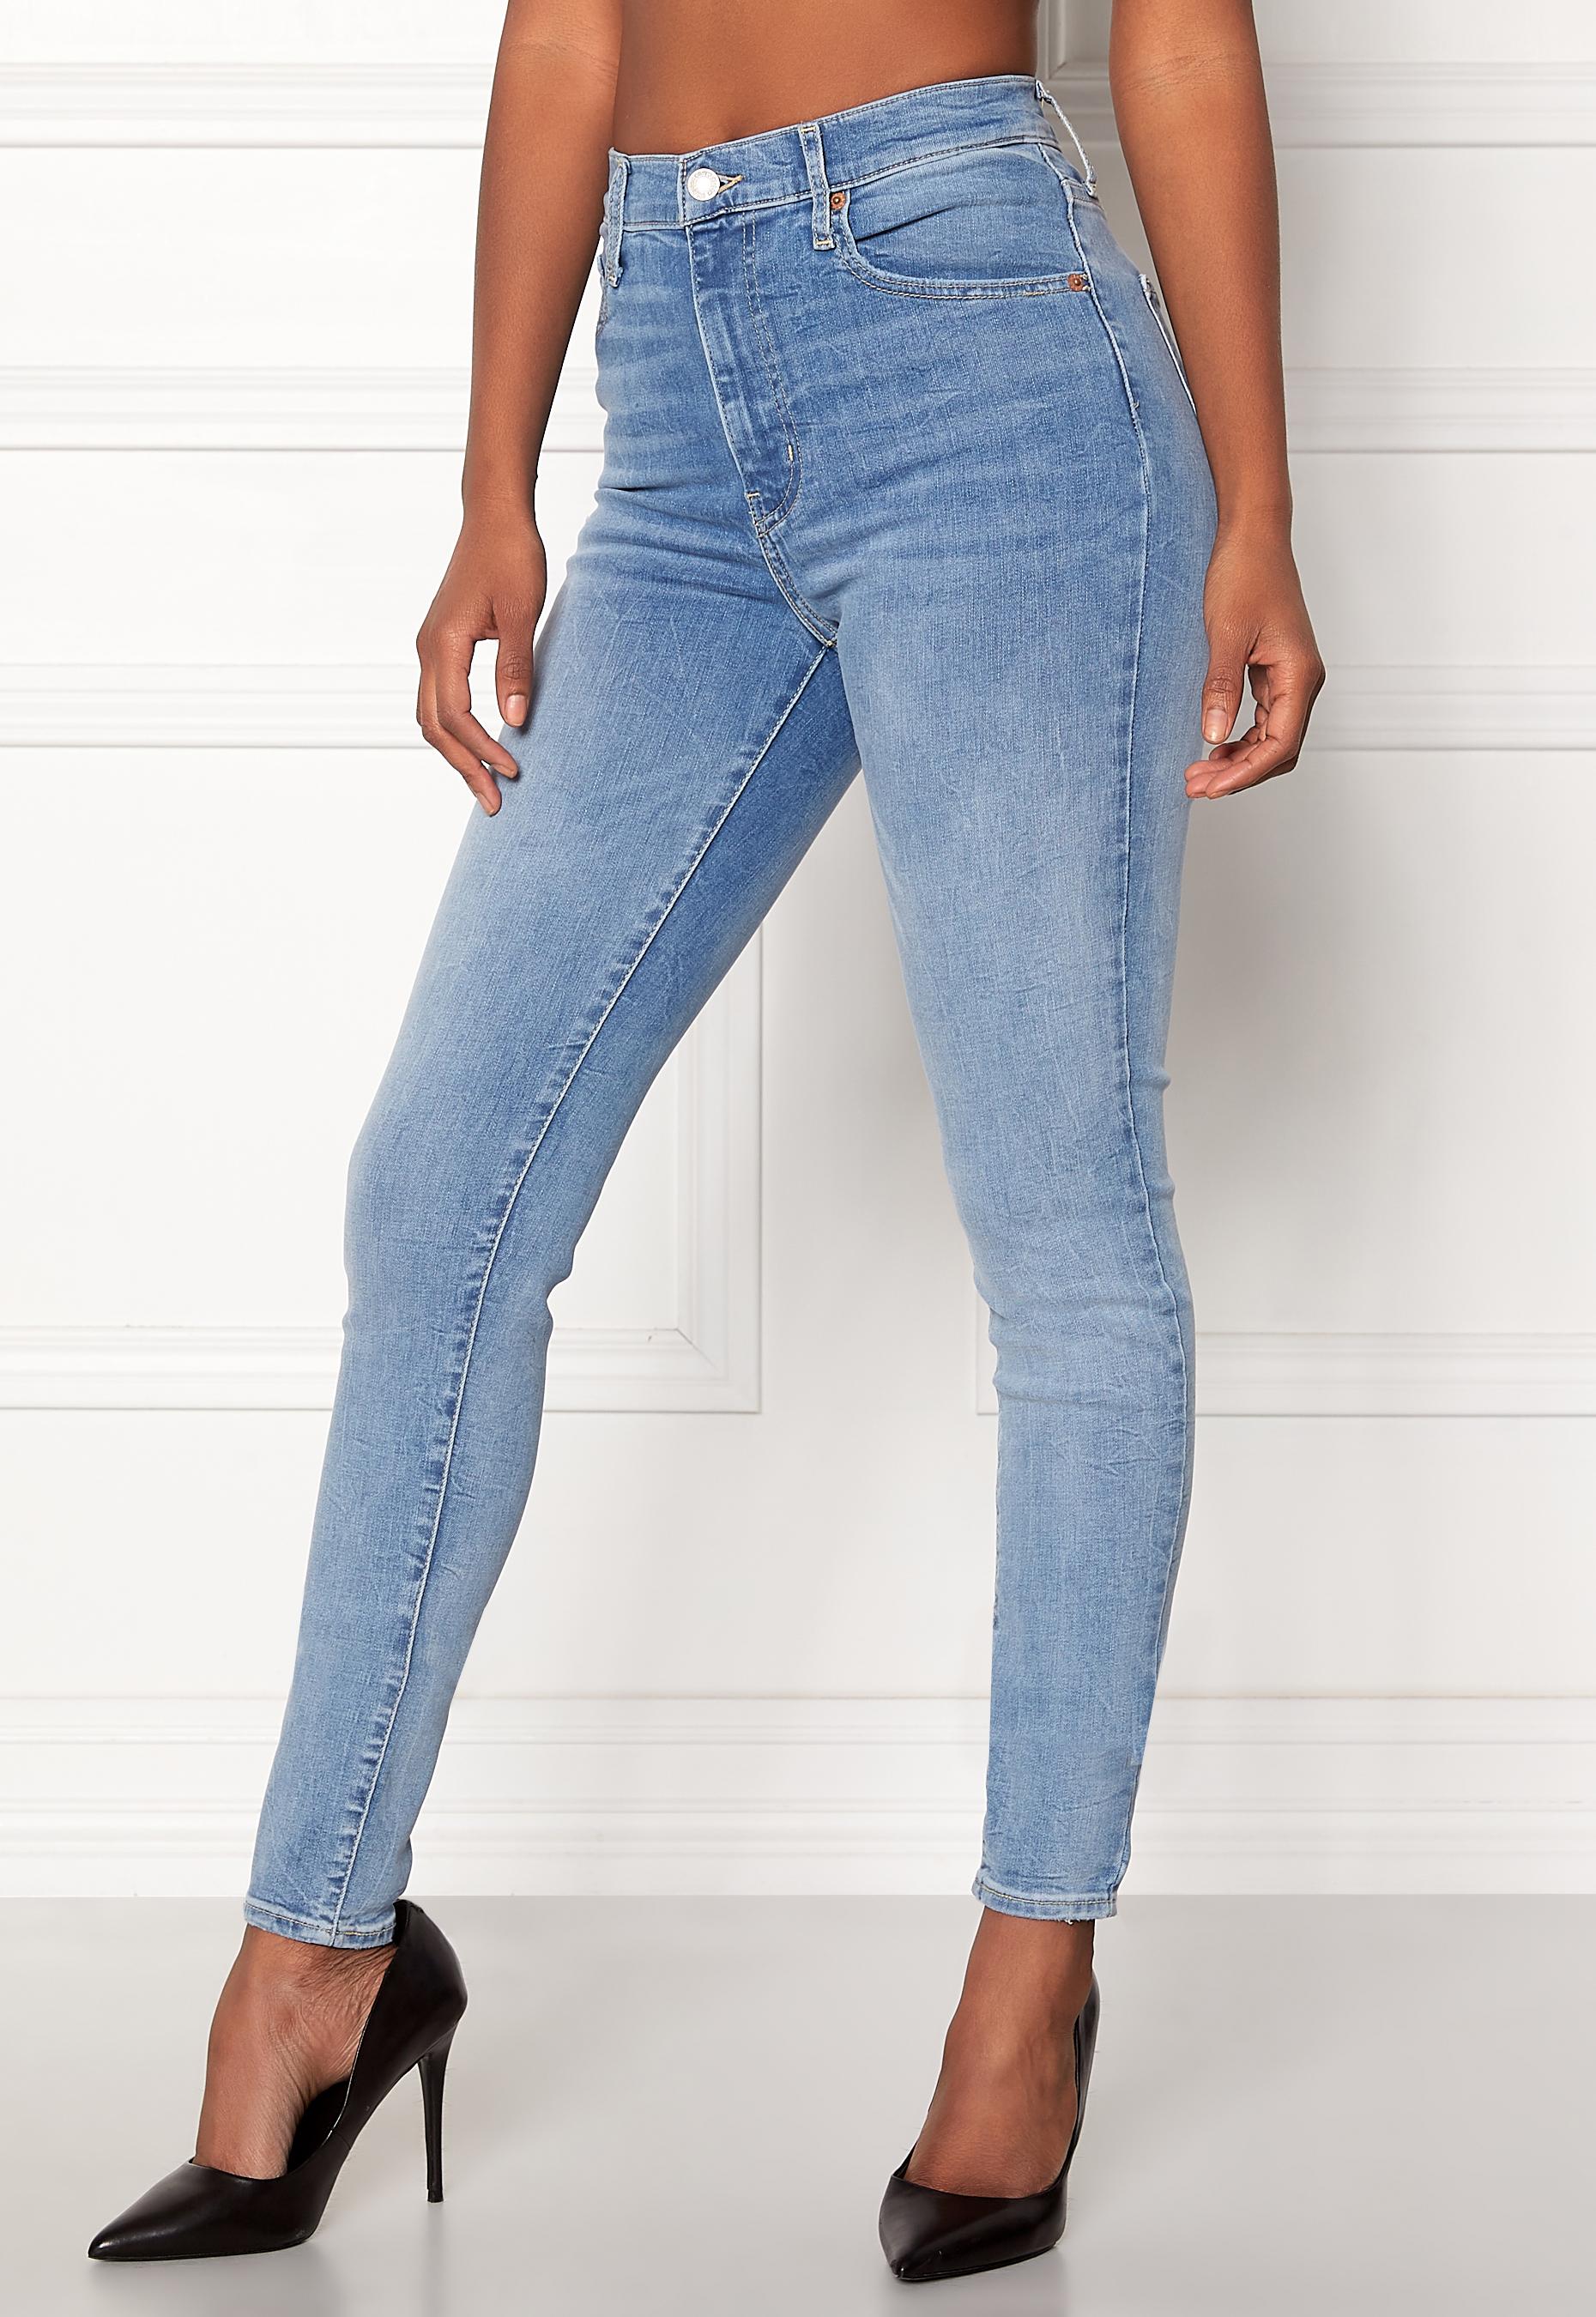 LEVI'S Milehigh Superskinny Jeans 0079 You Got Me Bubbleroom